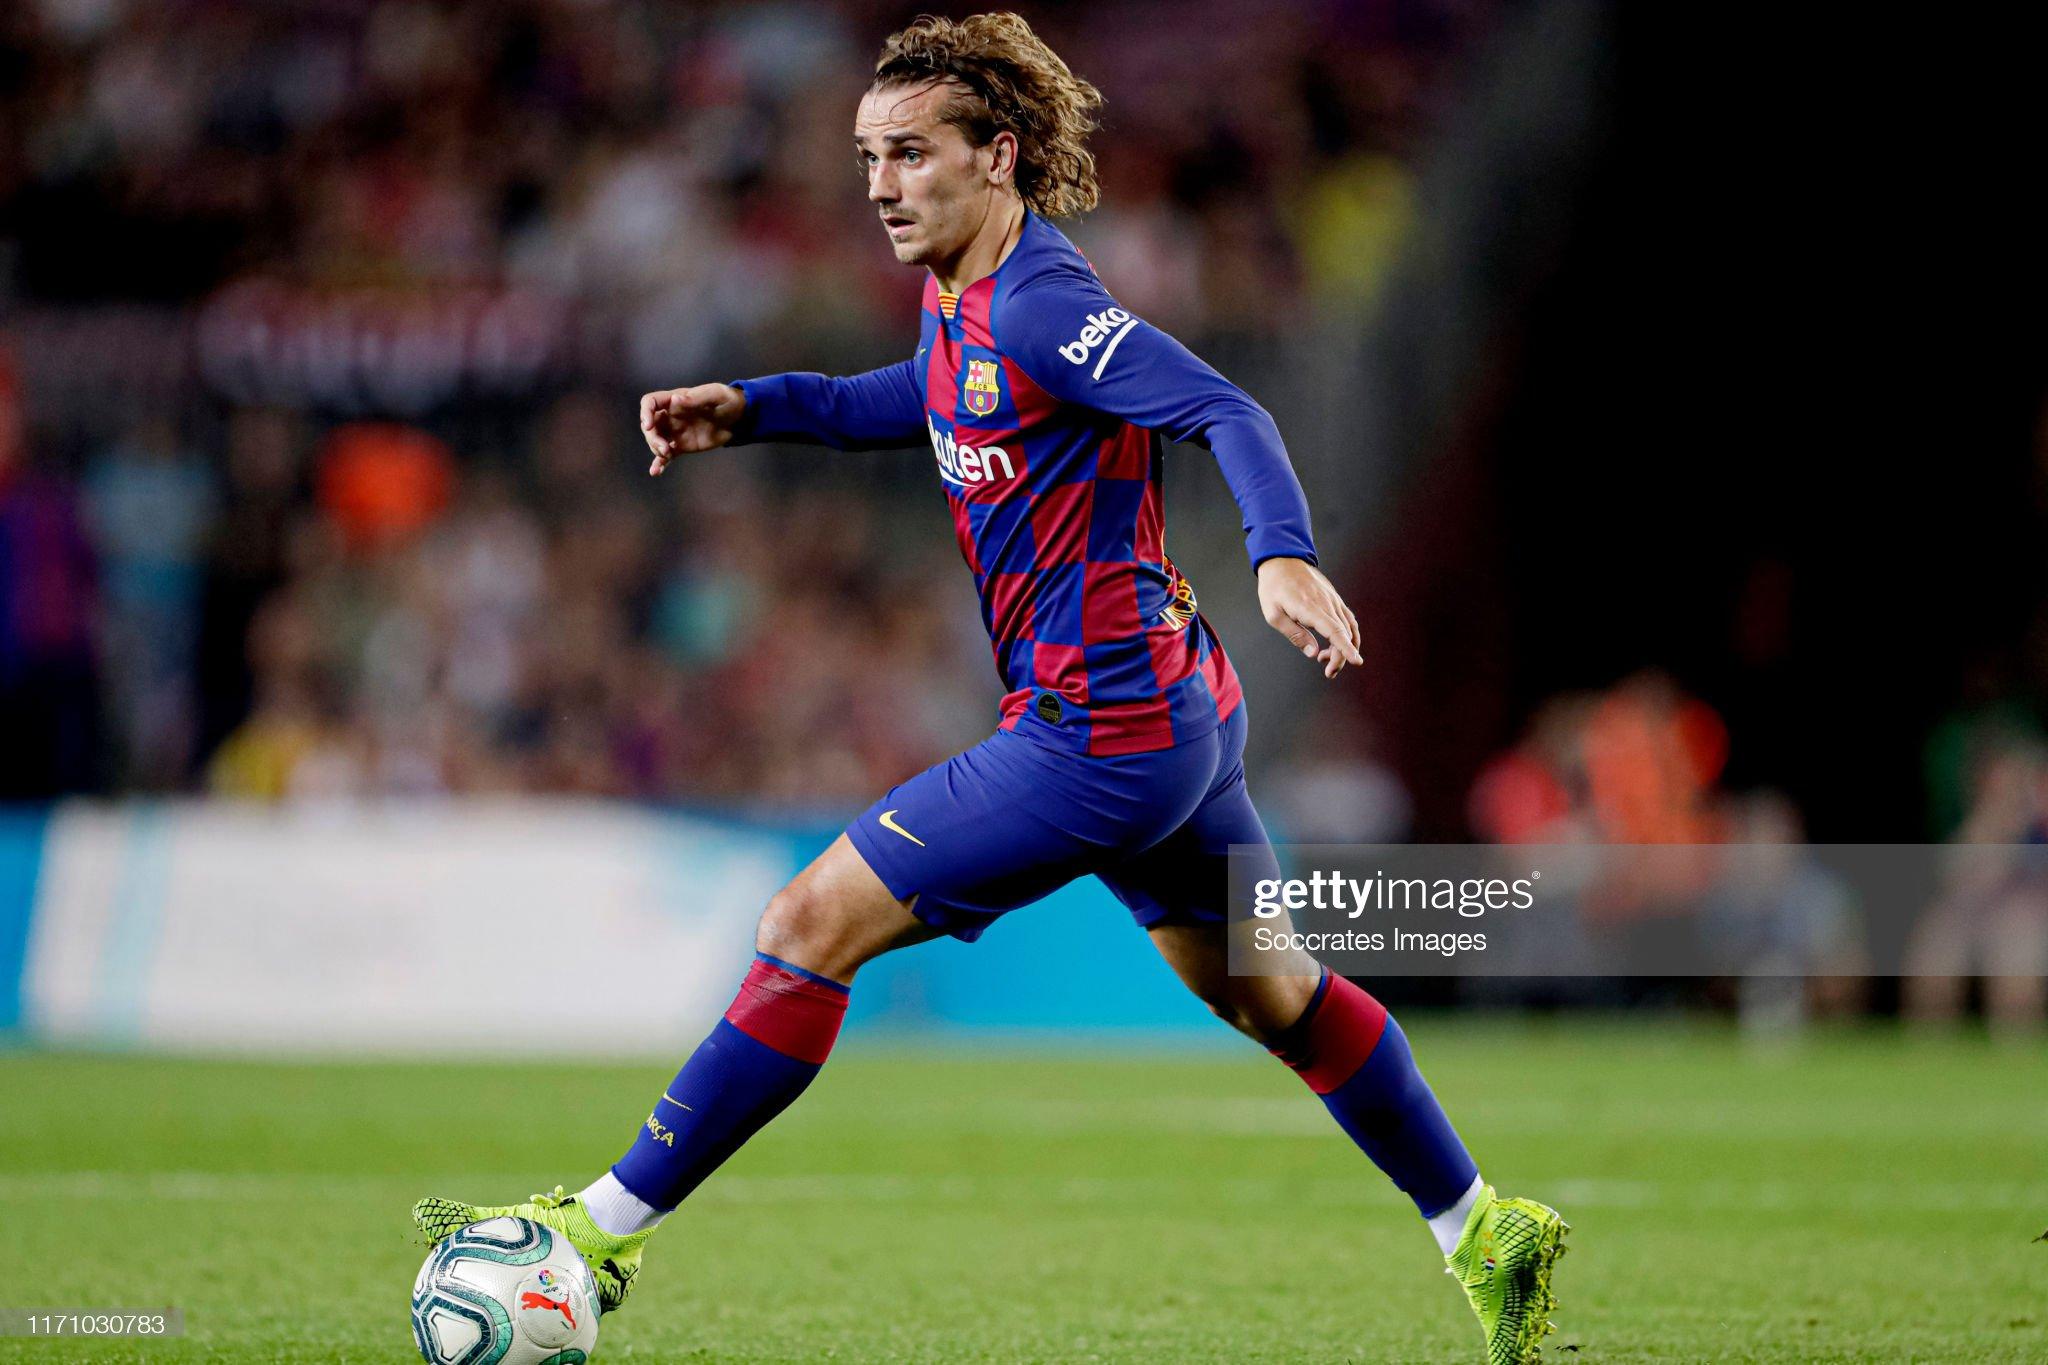 صور مباراة : برشلونة - فياريال 2-1 ( 24-09-2019 )  Antoine-griezmann-of-fc-barcelona-during-the-la-liga-santander-match-picture-id1171030783?s=2048x2048